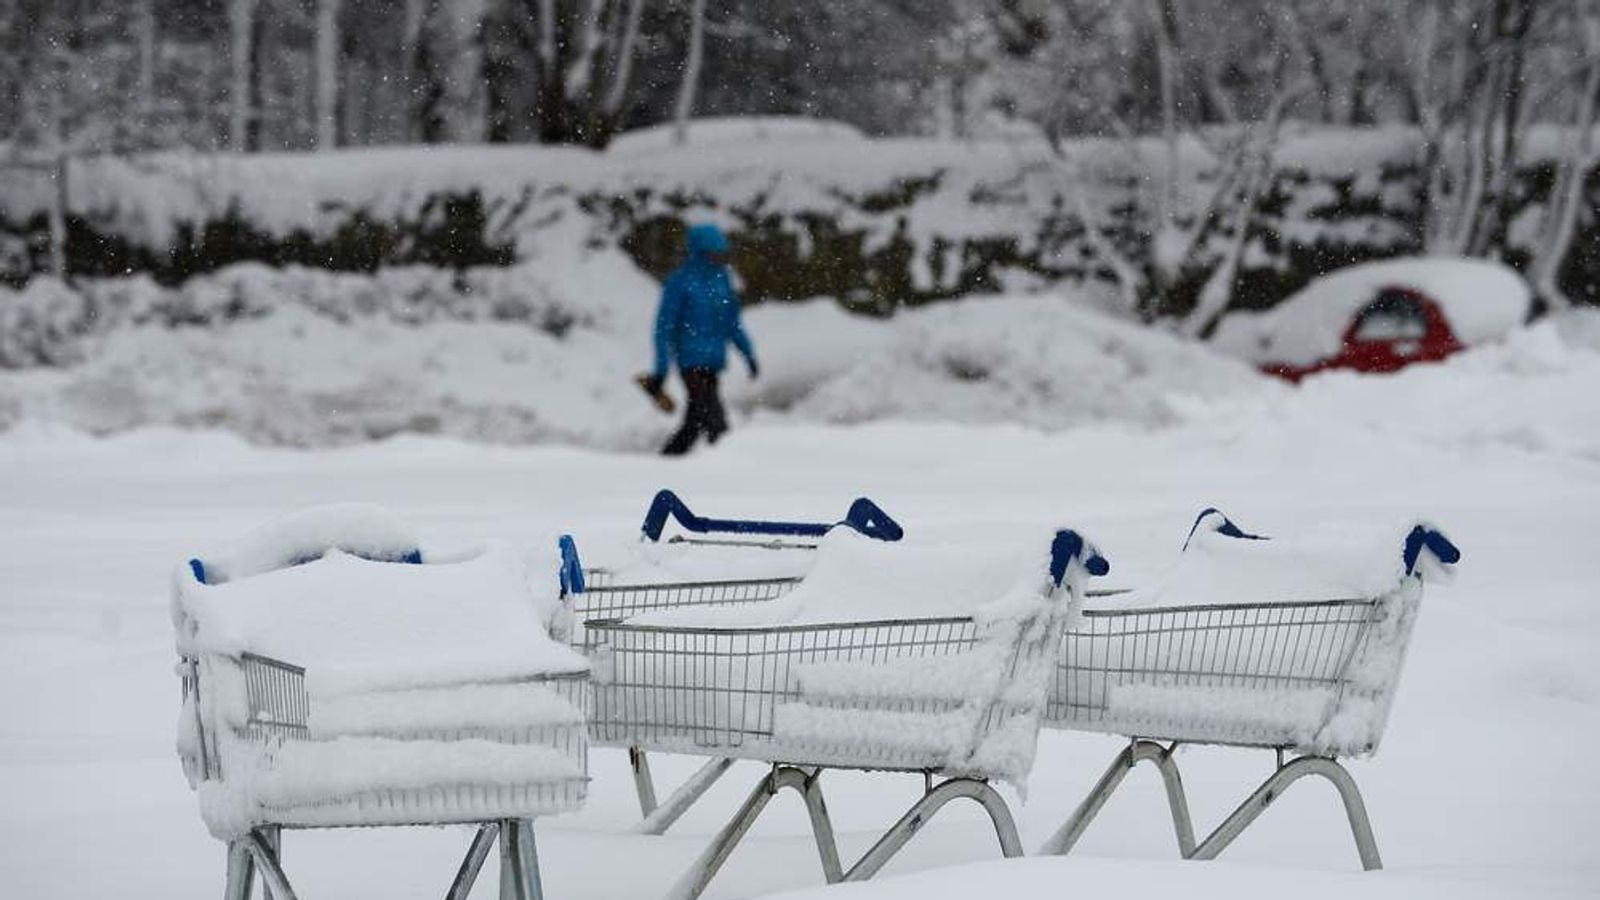 BRITAIN-WEATHER-SNOW